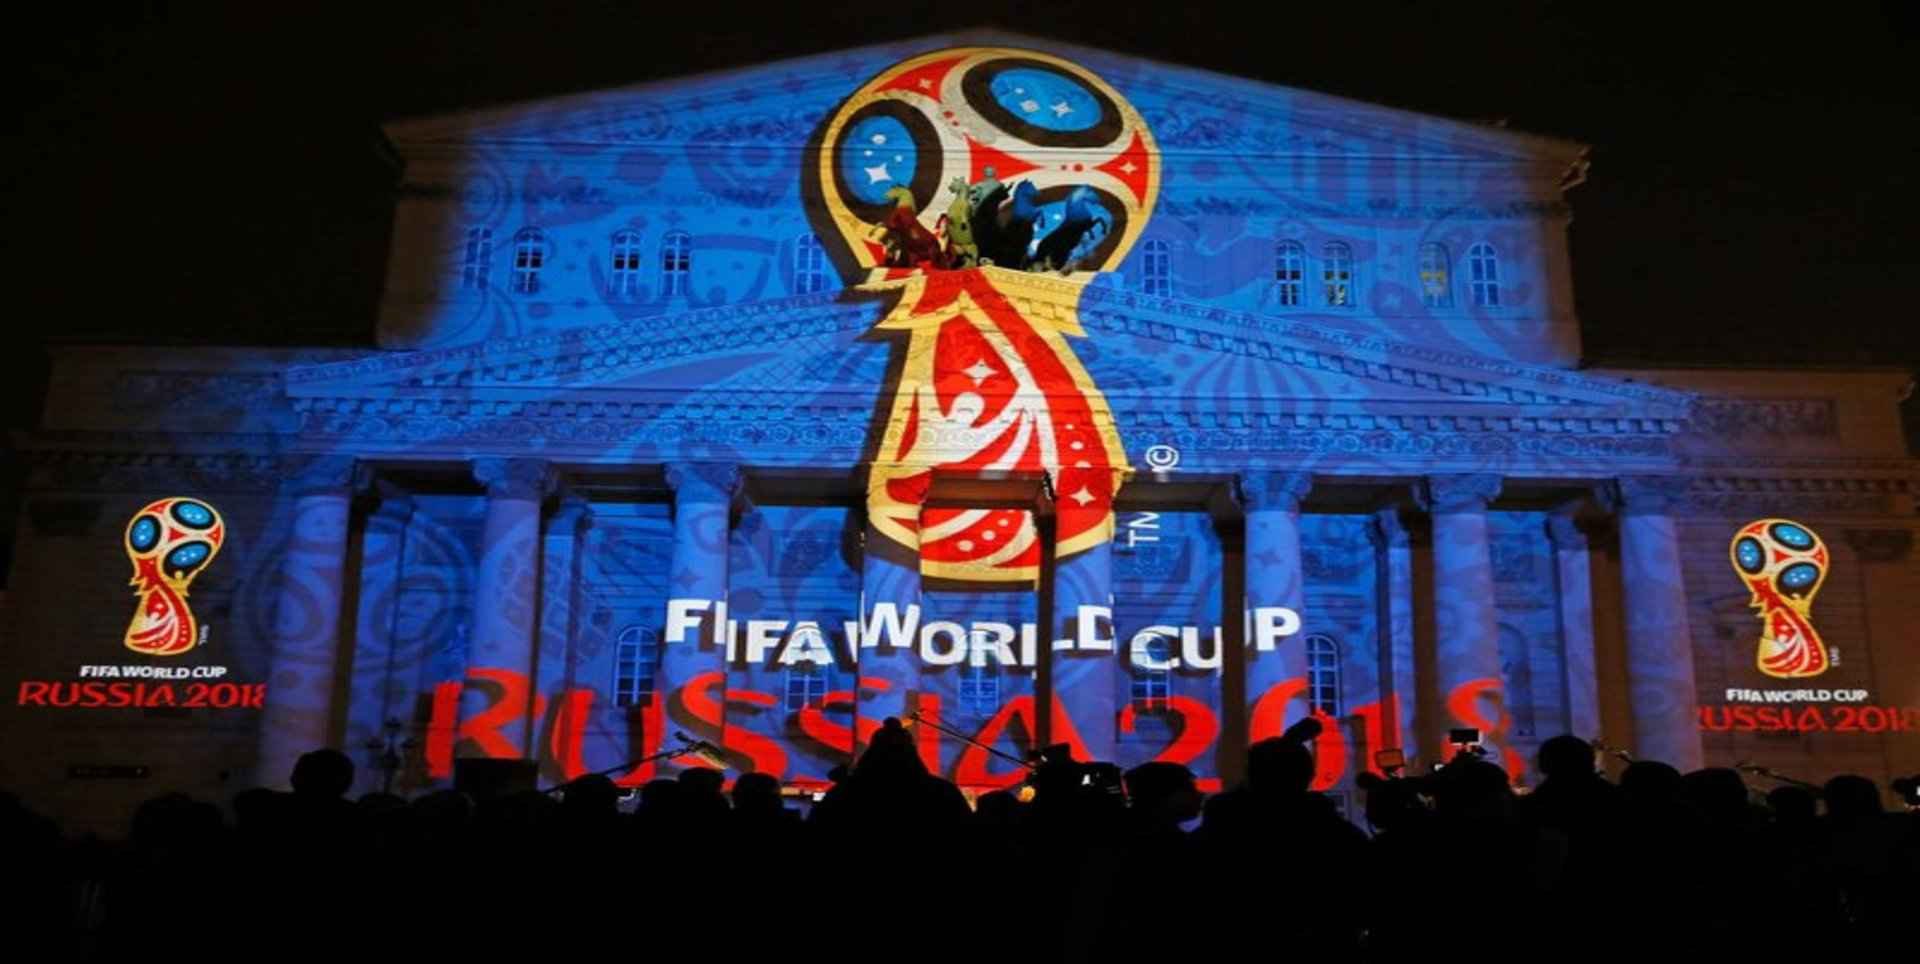 CONMEBOL Matchday 14 Bolivia VS Argentine Live